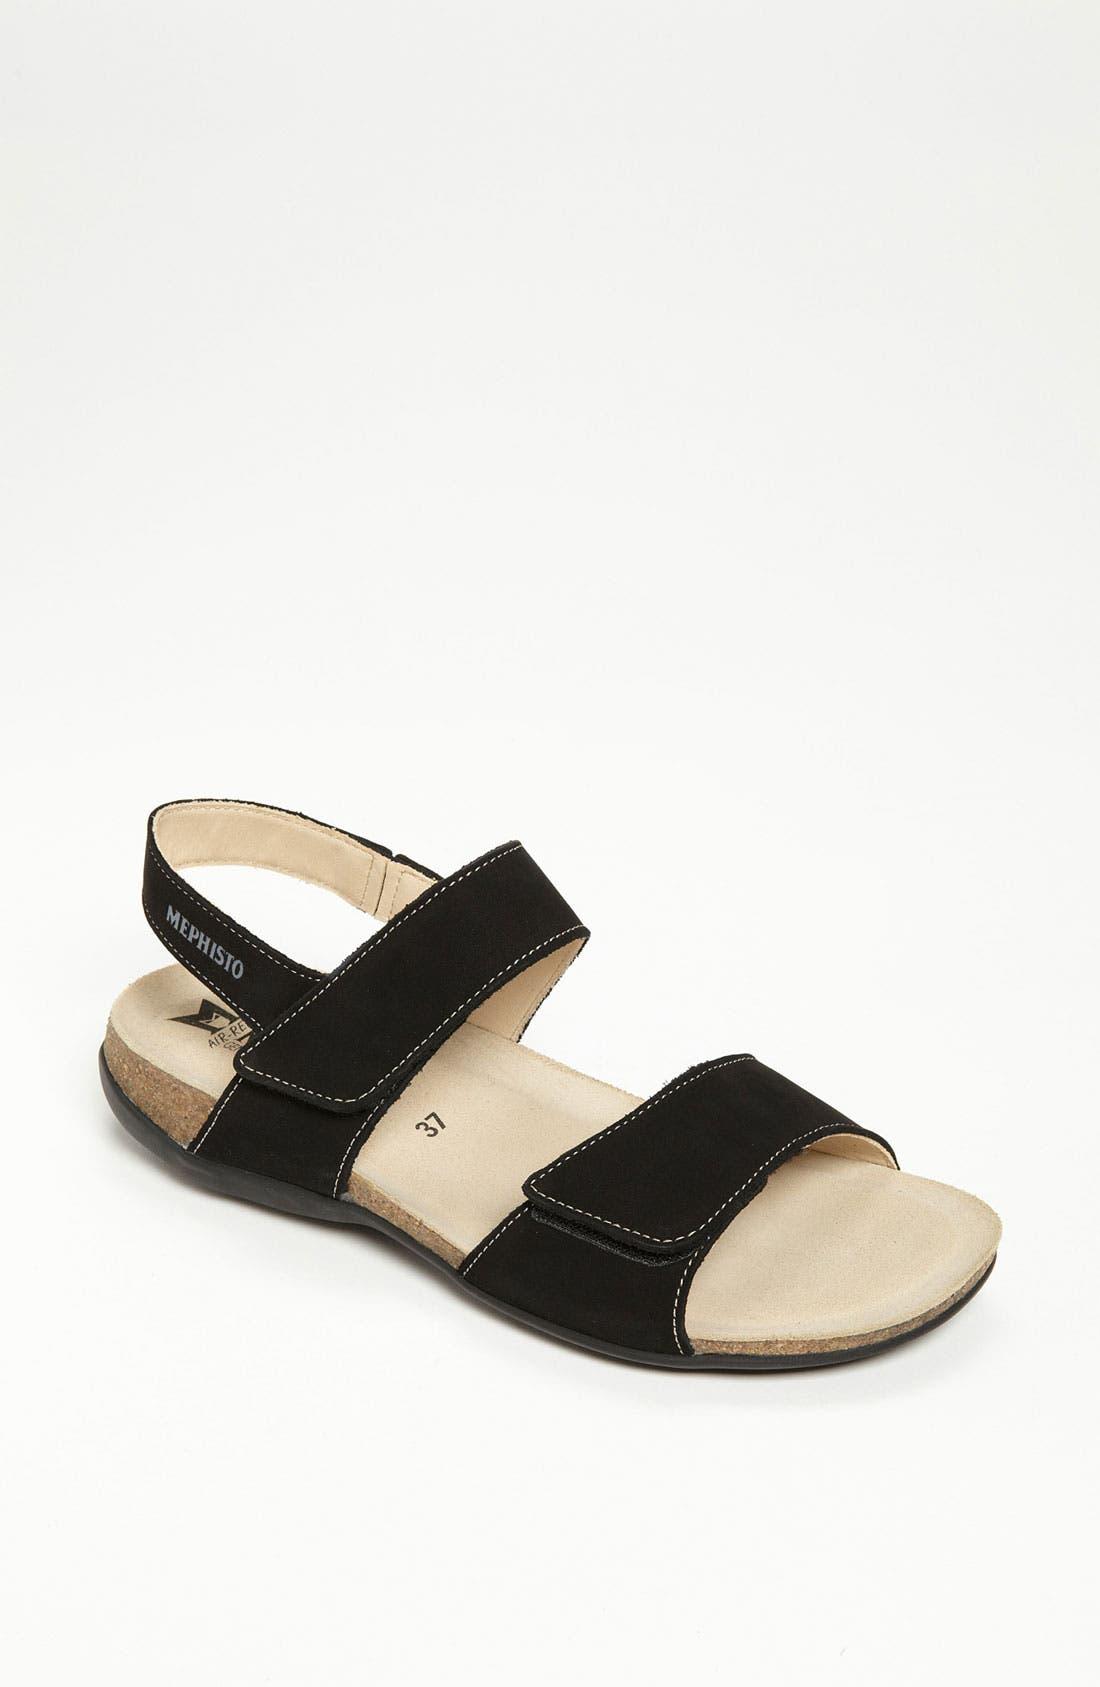 'Agave' Sandal,                             Main thumbnail 1, color,                             004